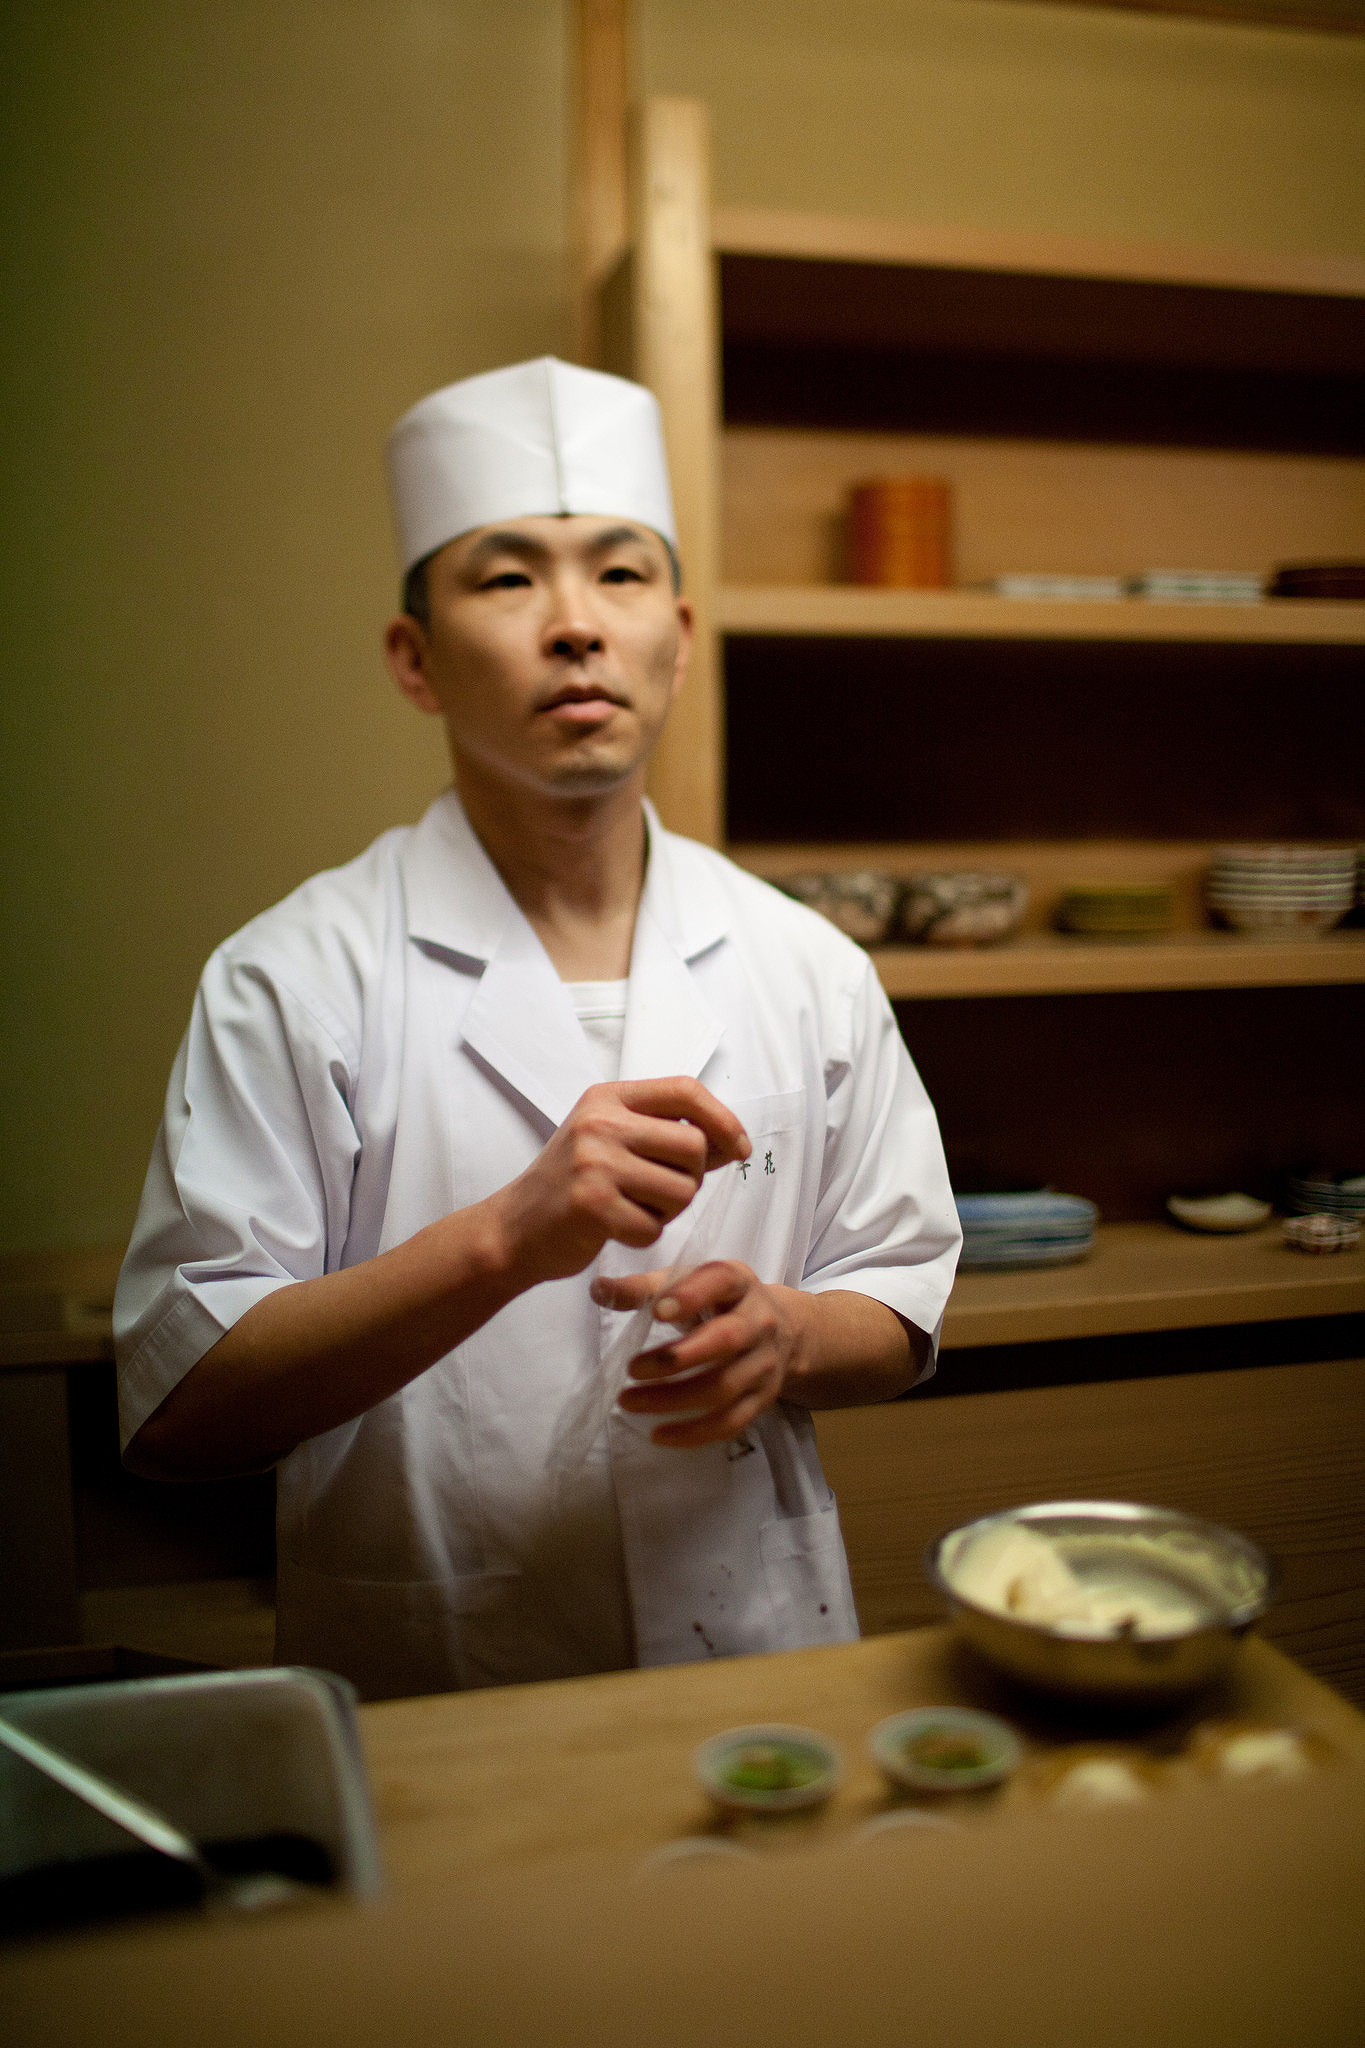 Chihana, Kyoto, Japan - Assistant Chef